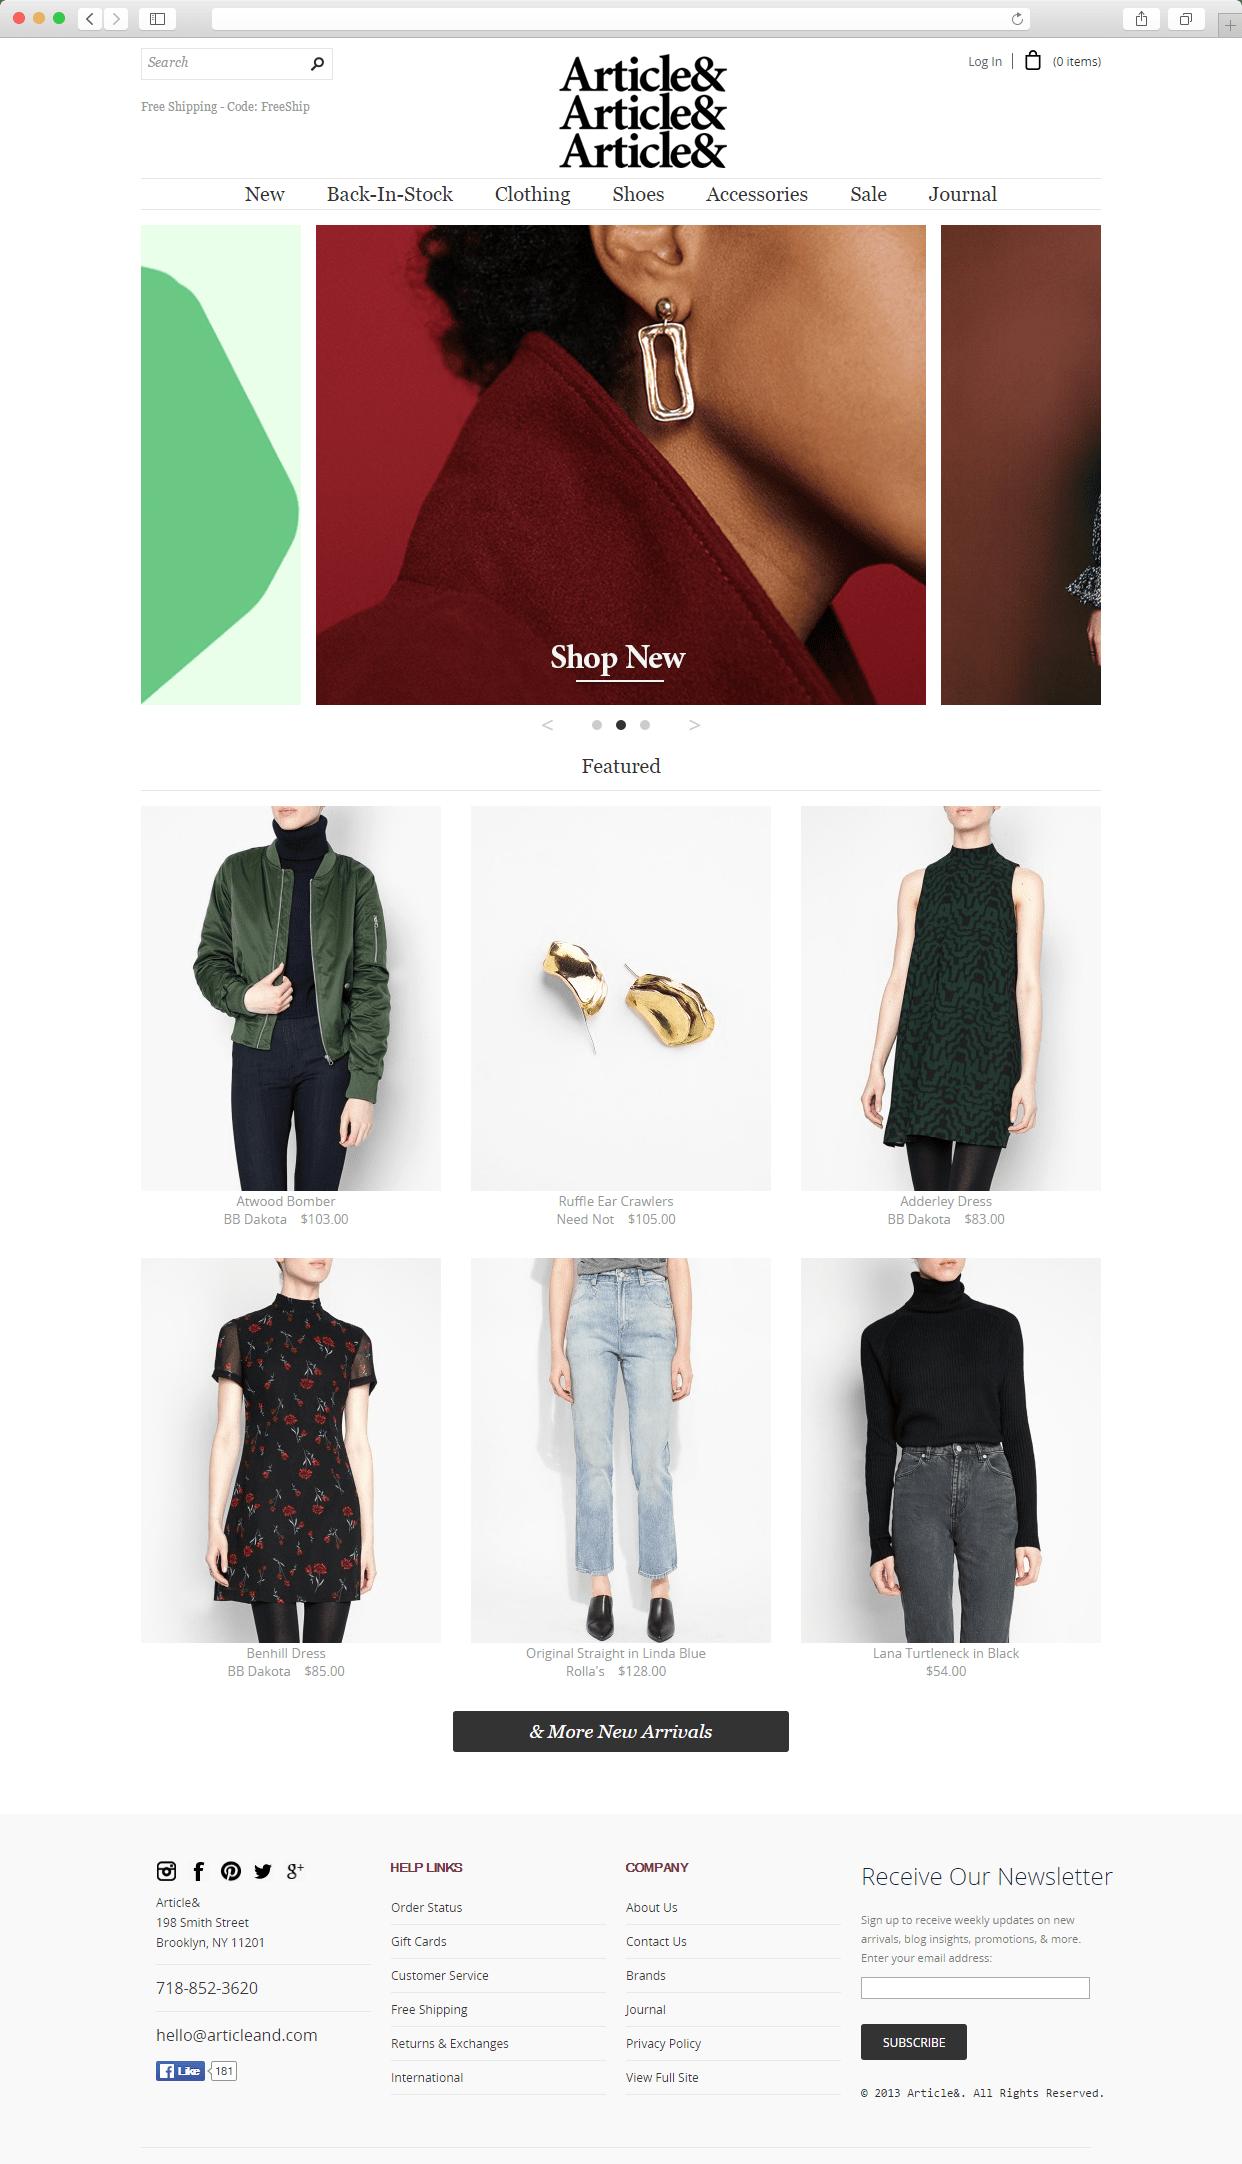 Modern e-Commerce Web-Design Trends. Part 1